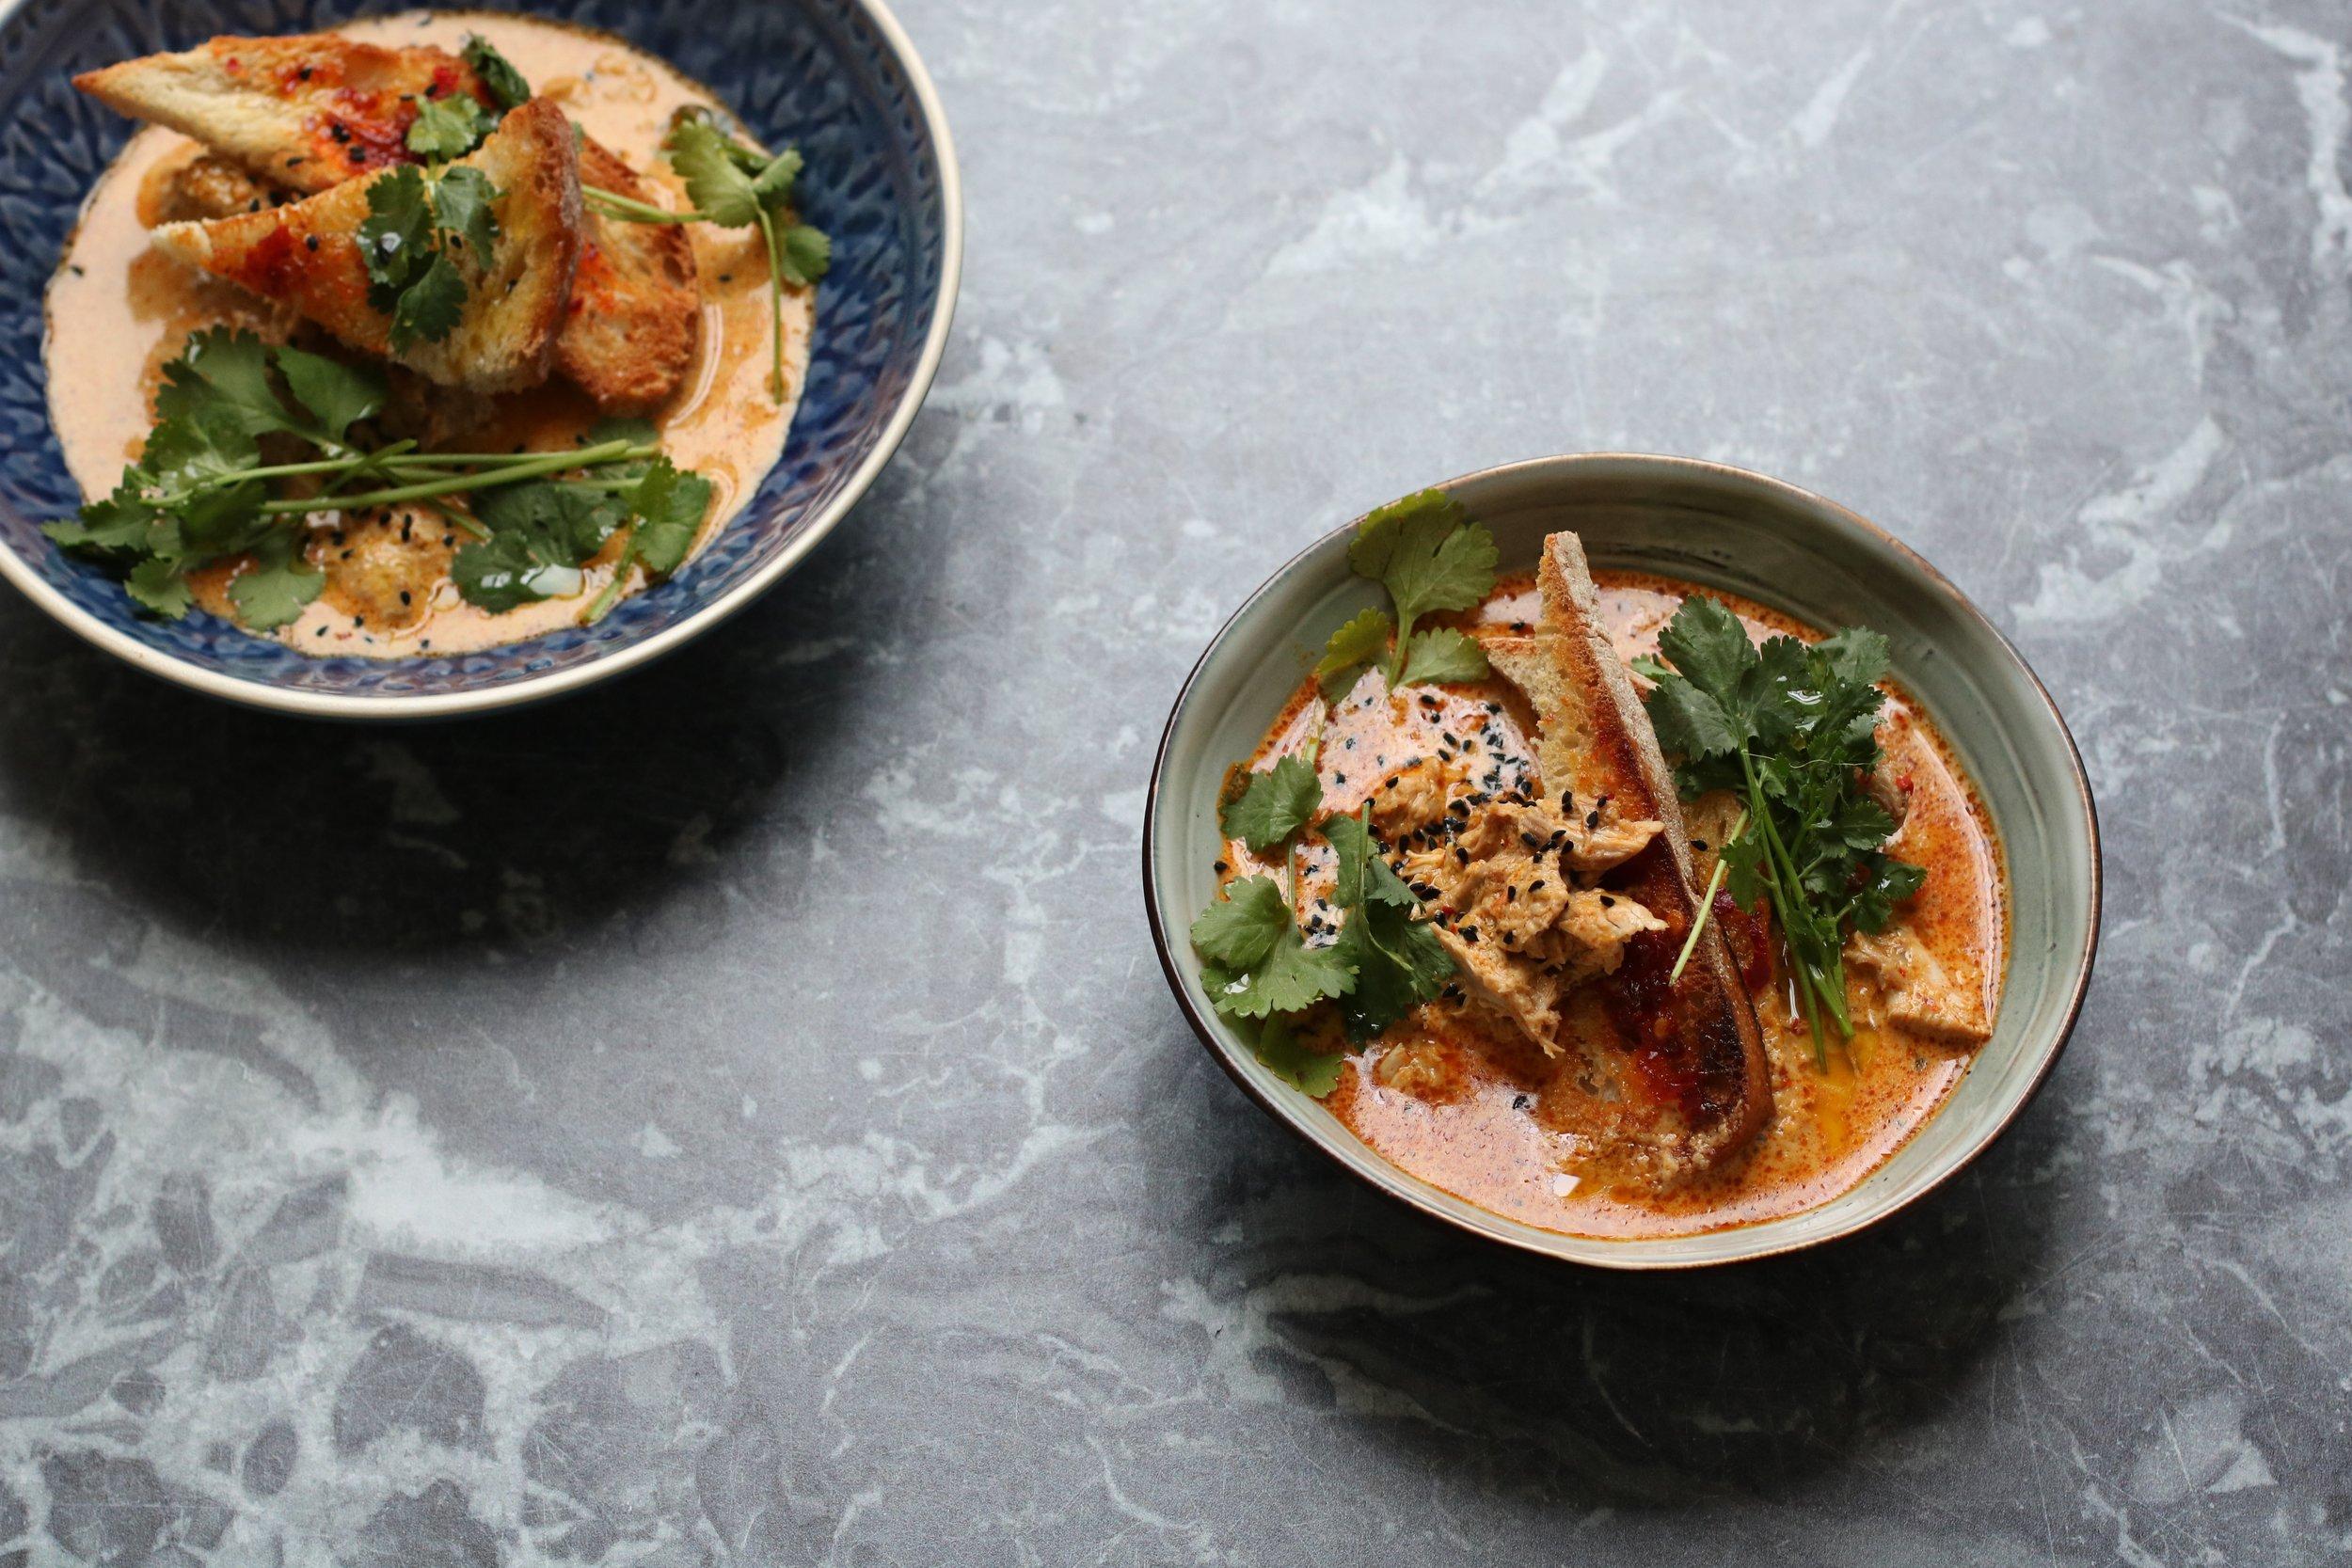 Curry pheasant